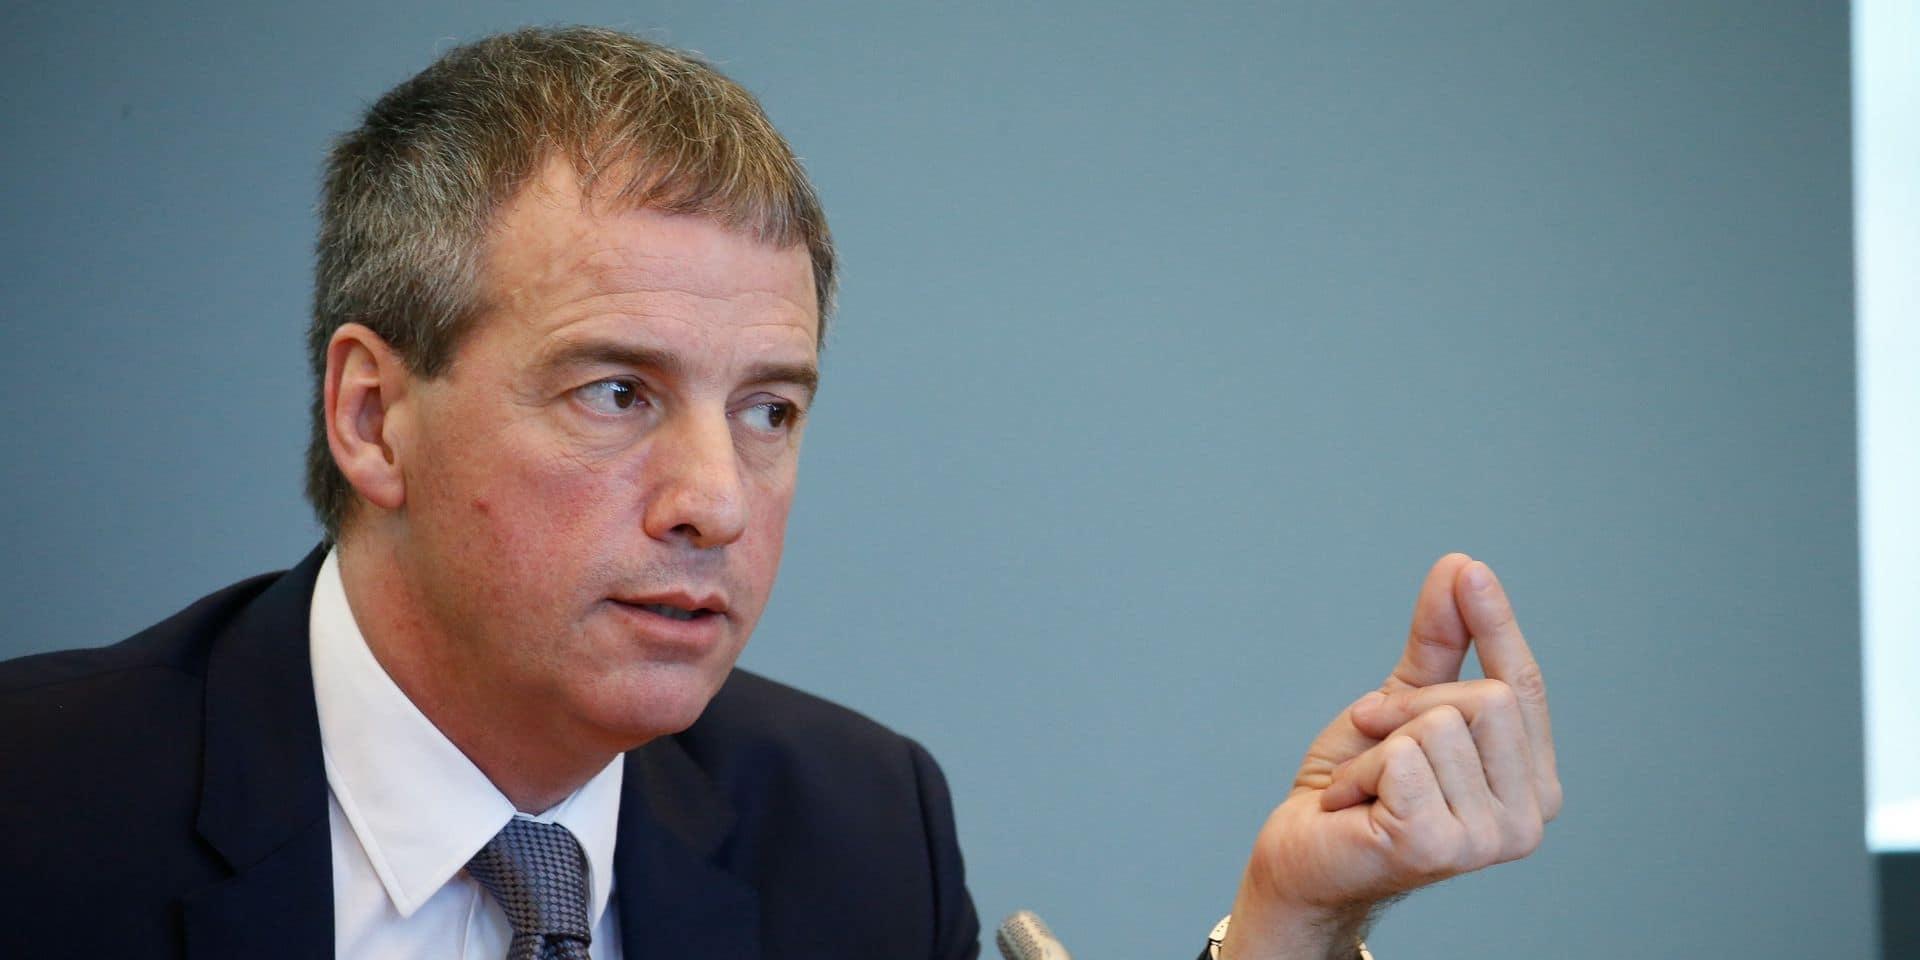 Stéphane Moreau se fait saisir 8 millions d'euros